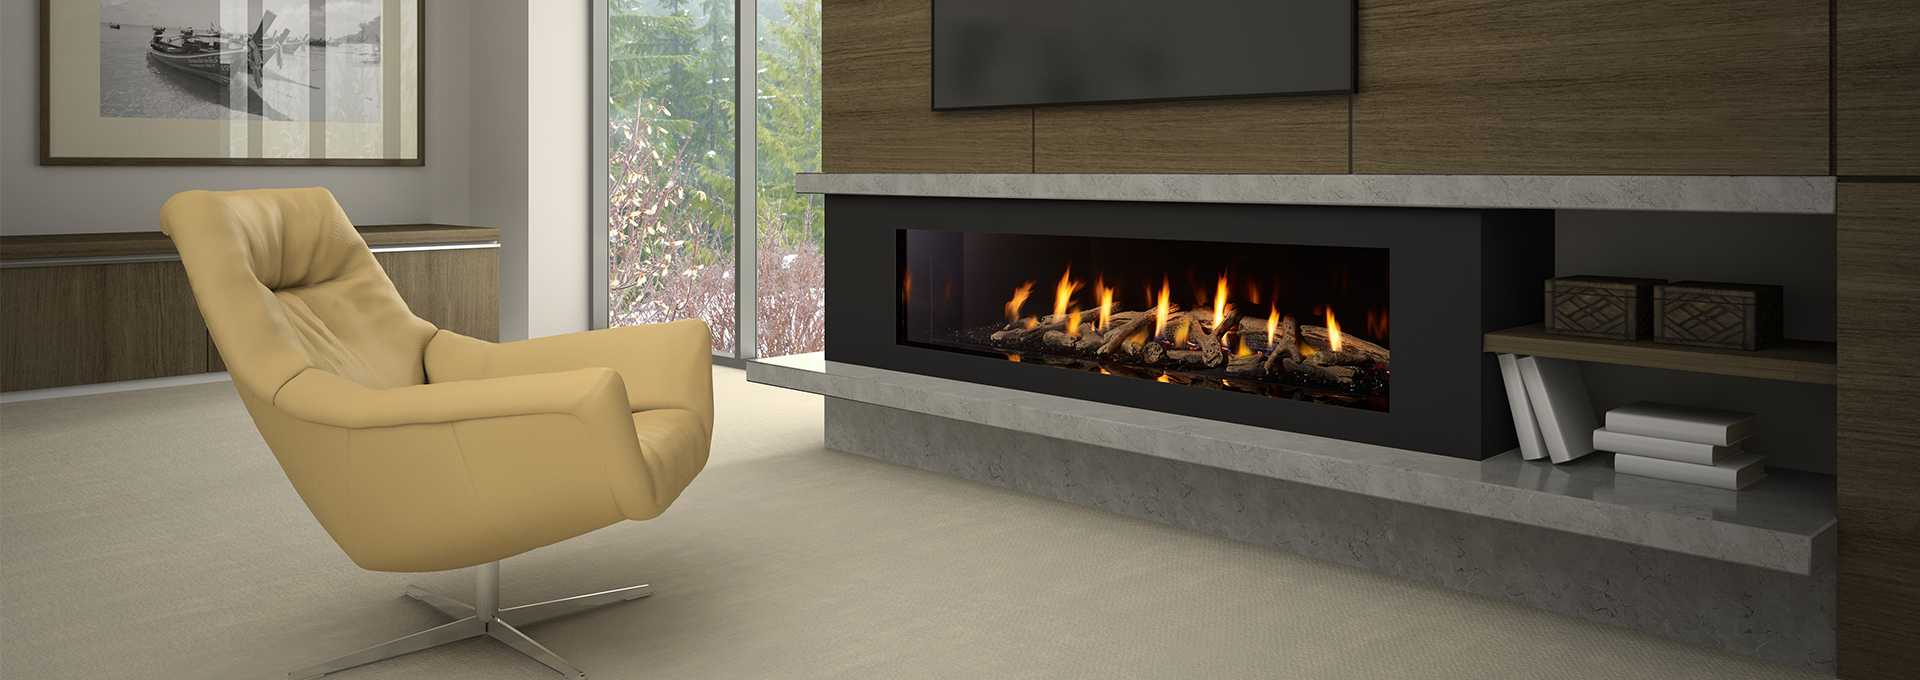 Top 5 Modern Fireplace Design Trends Of 2017